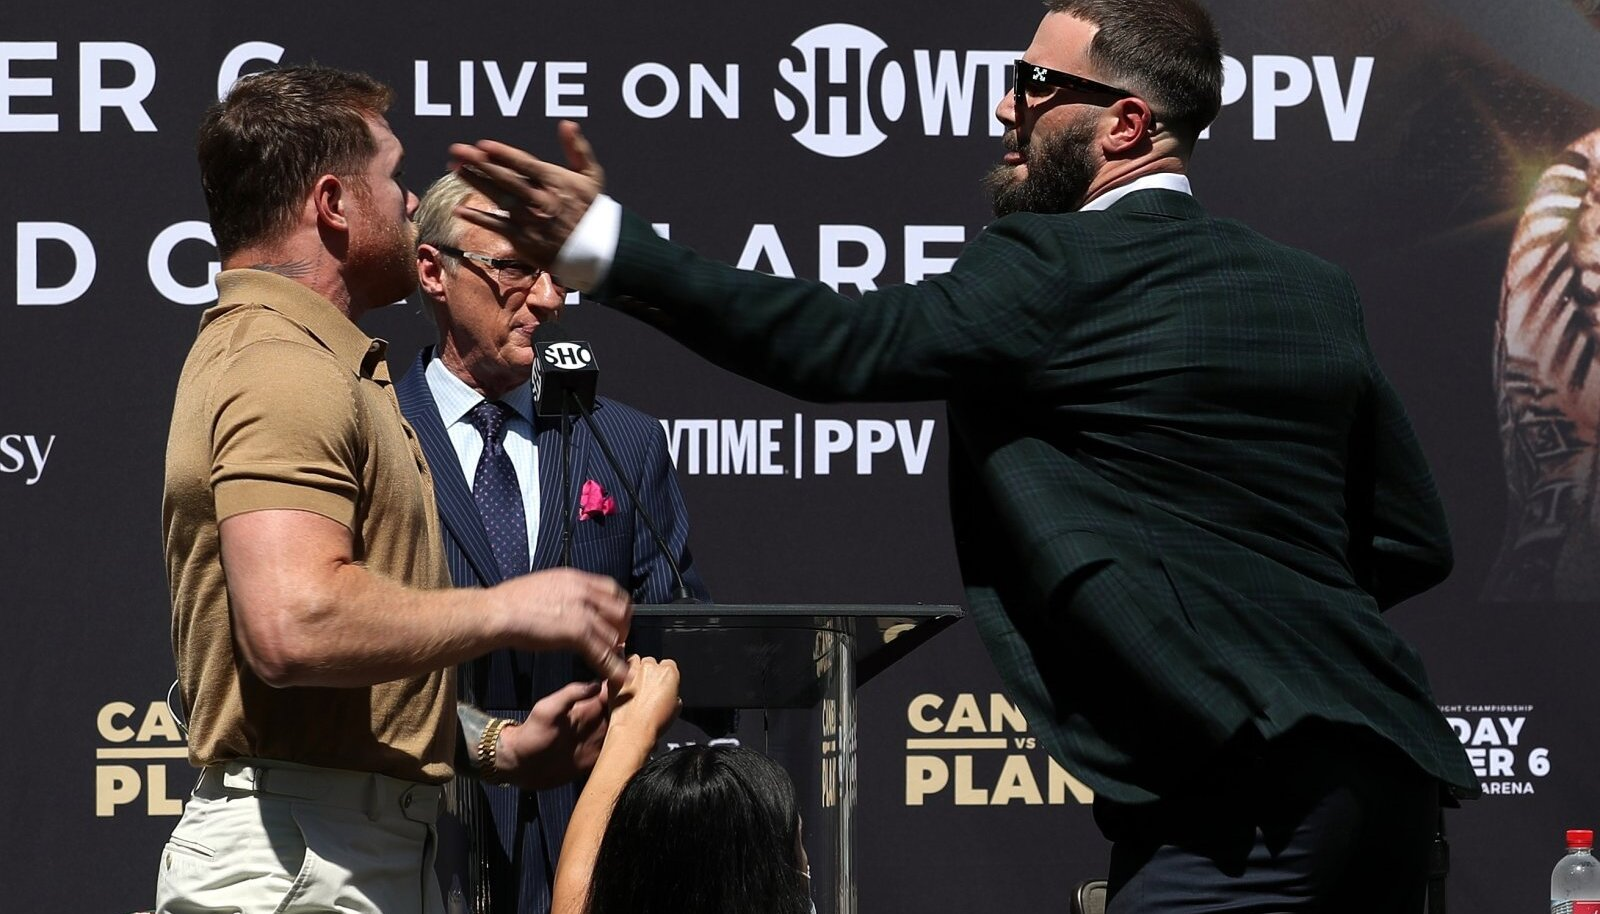 Caleb Plant (paremal) lõi Canelo Alvarezt lahtise käega.